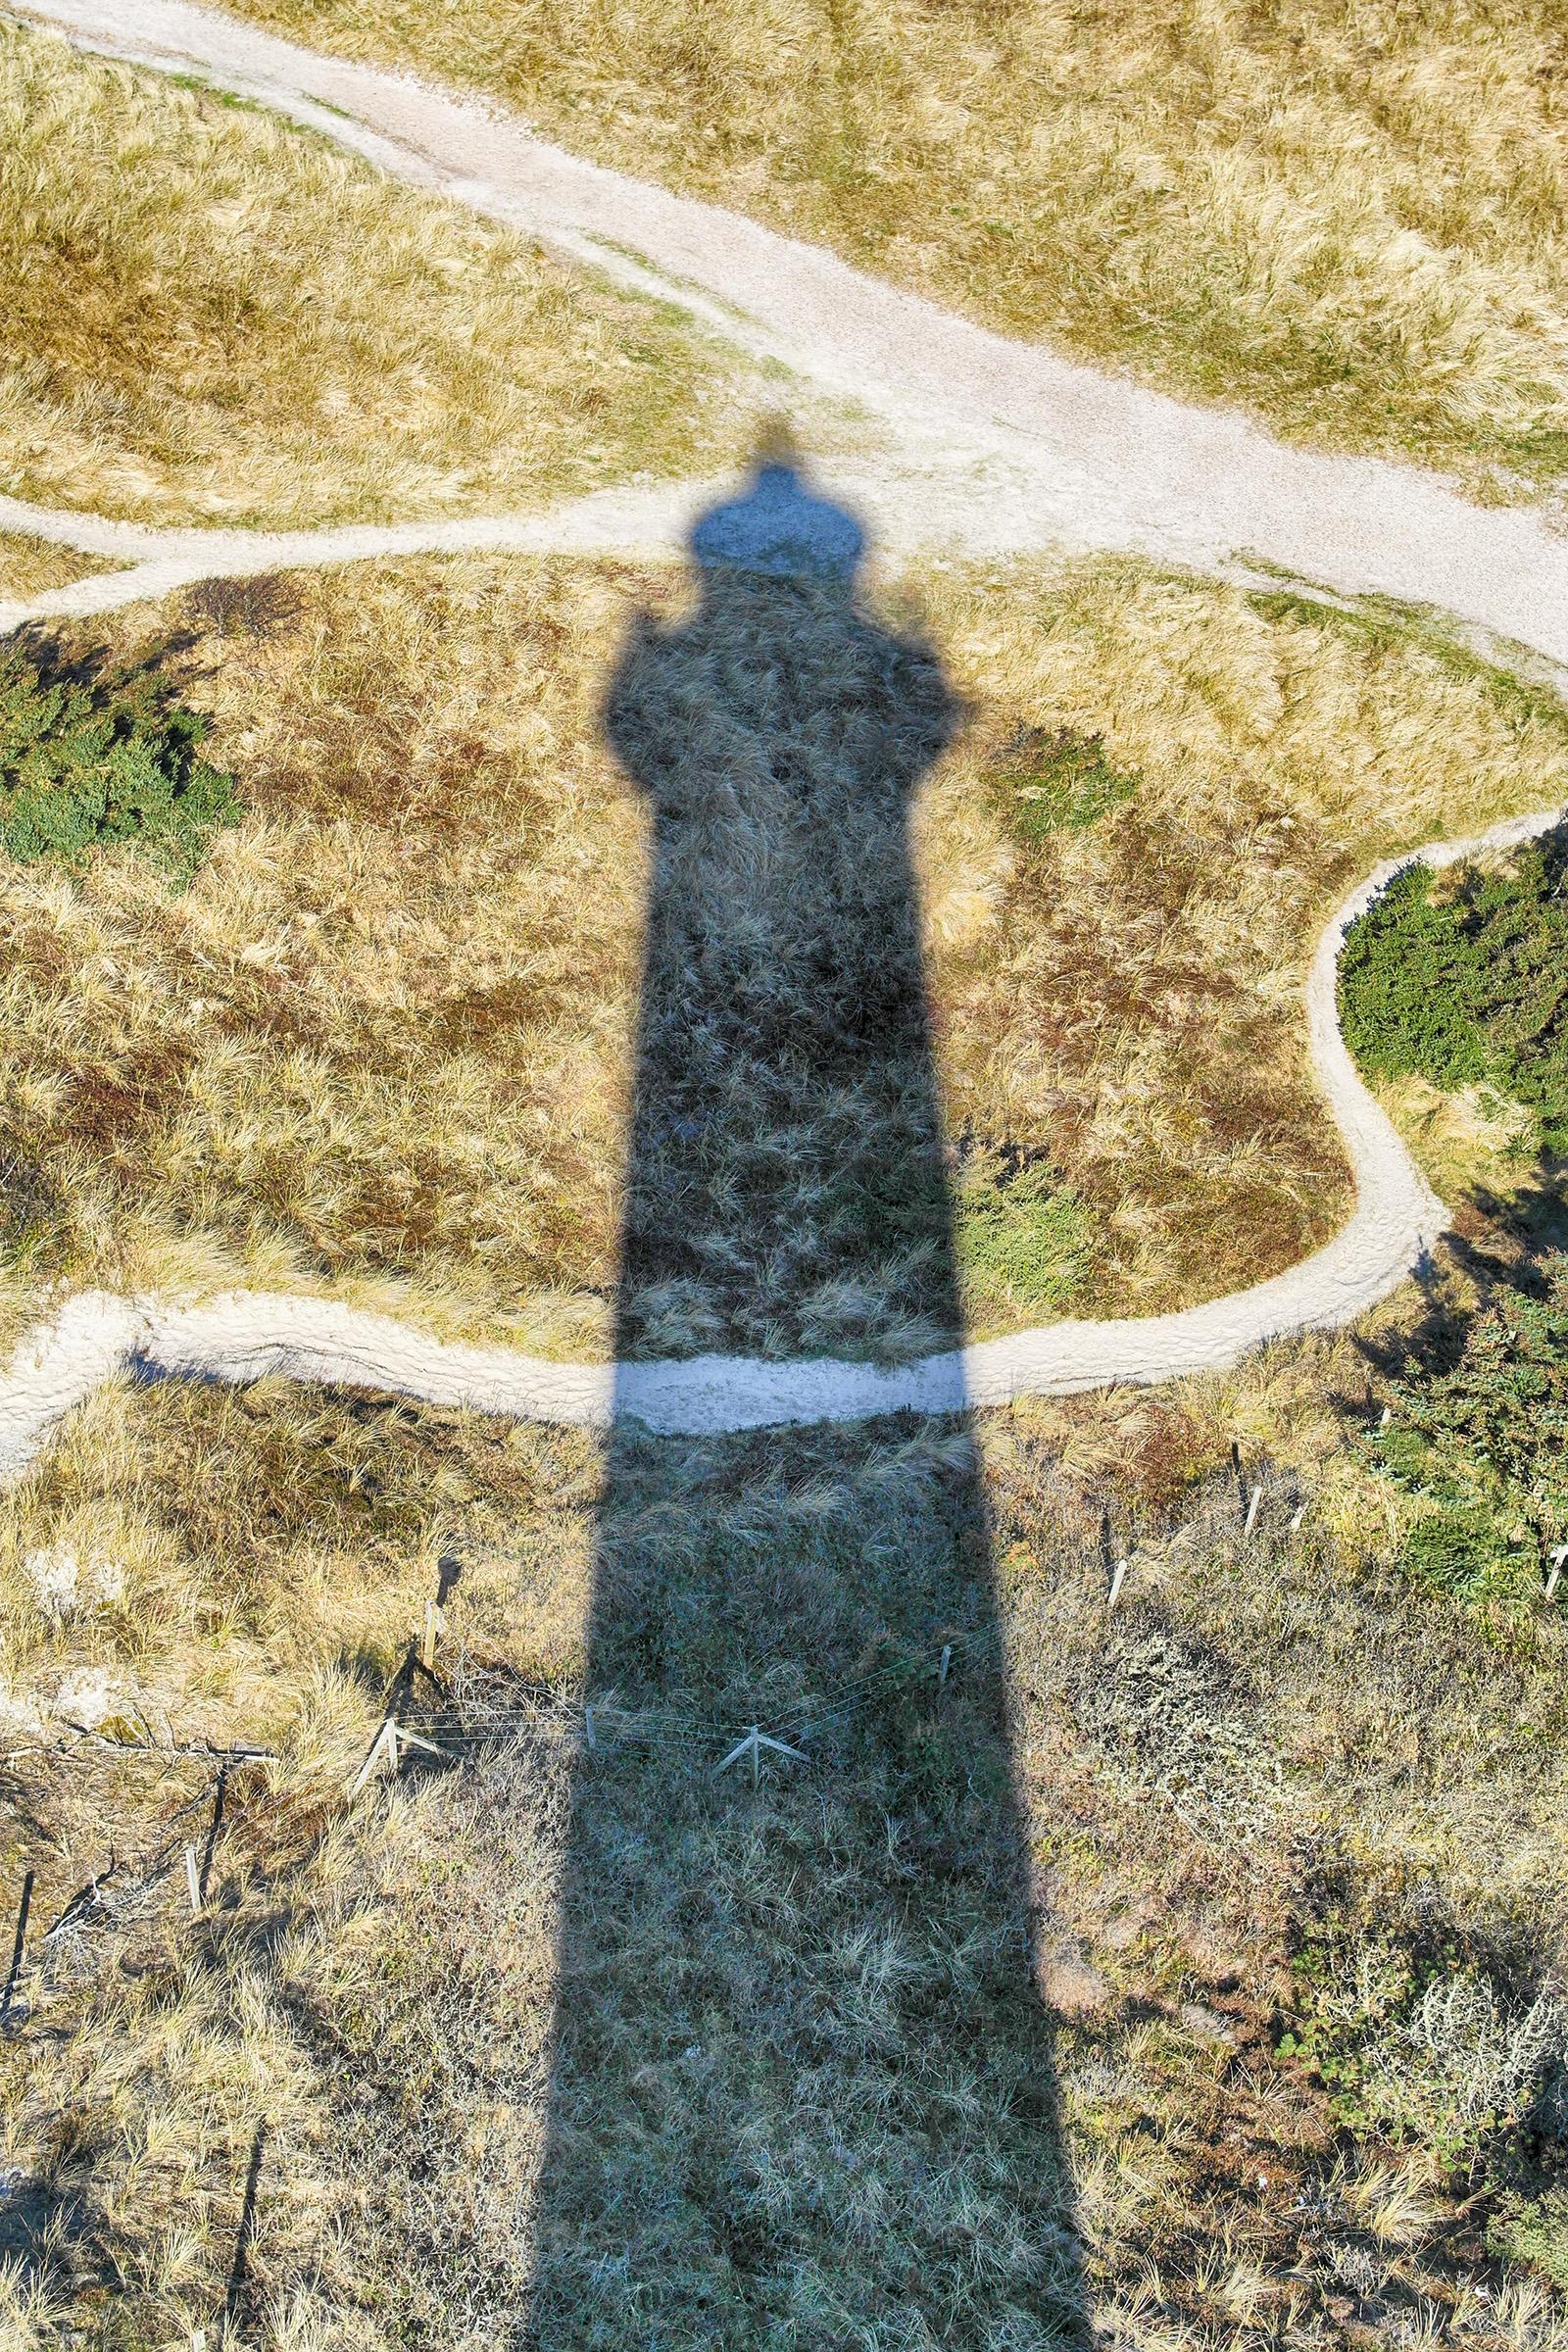 Lyngvig Fyr (DK) - Leuchtturm